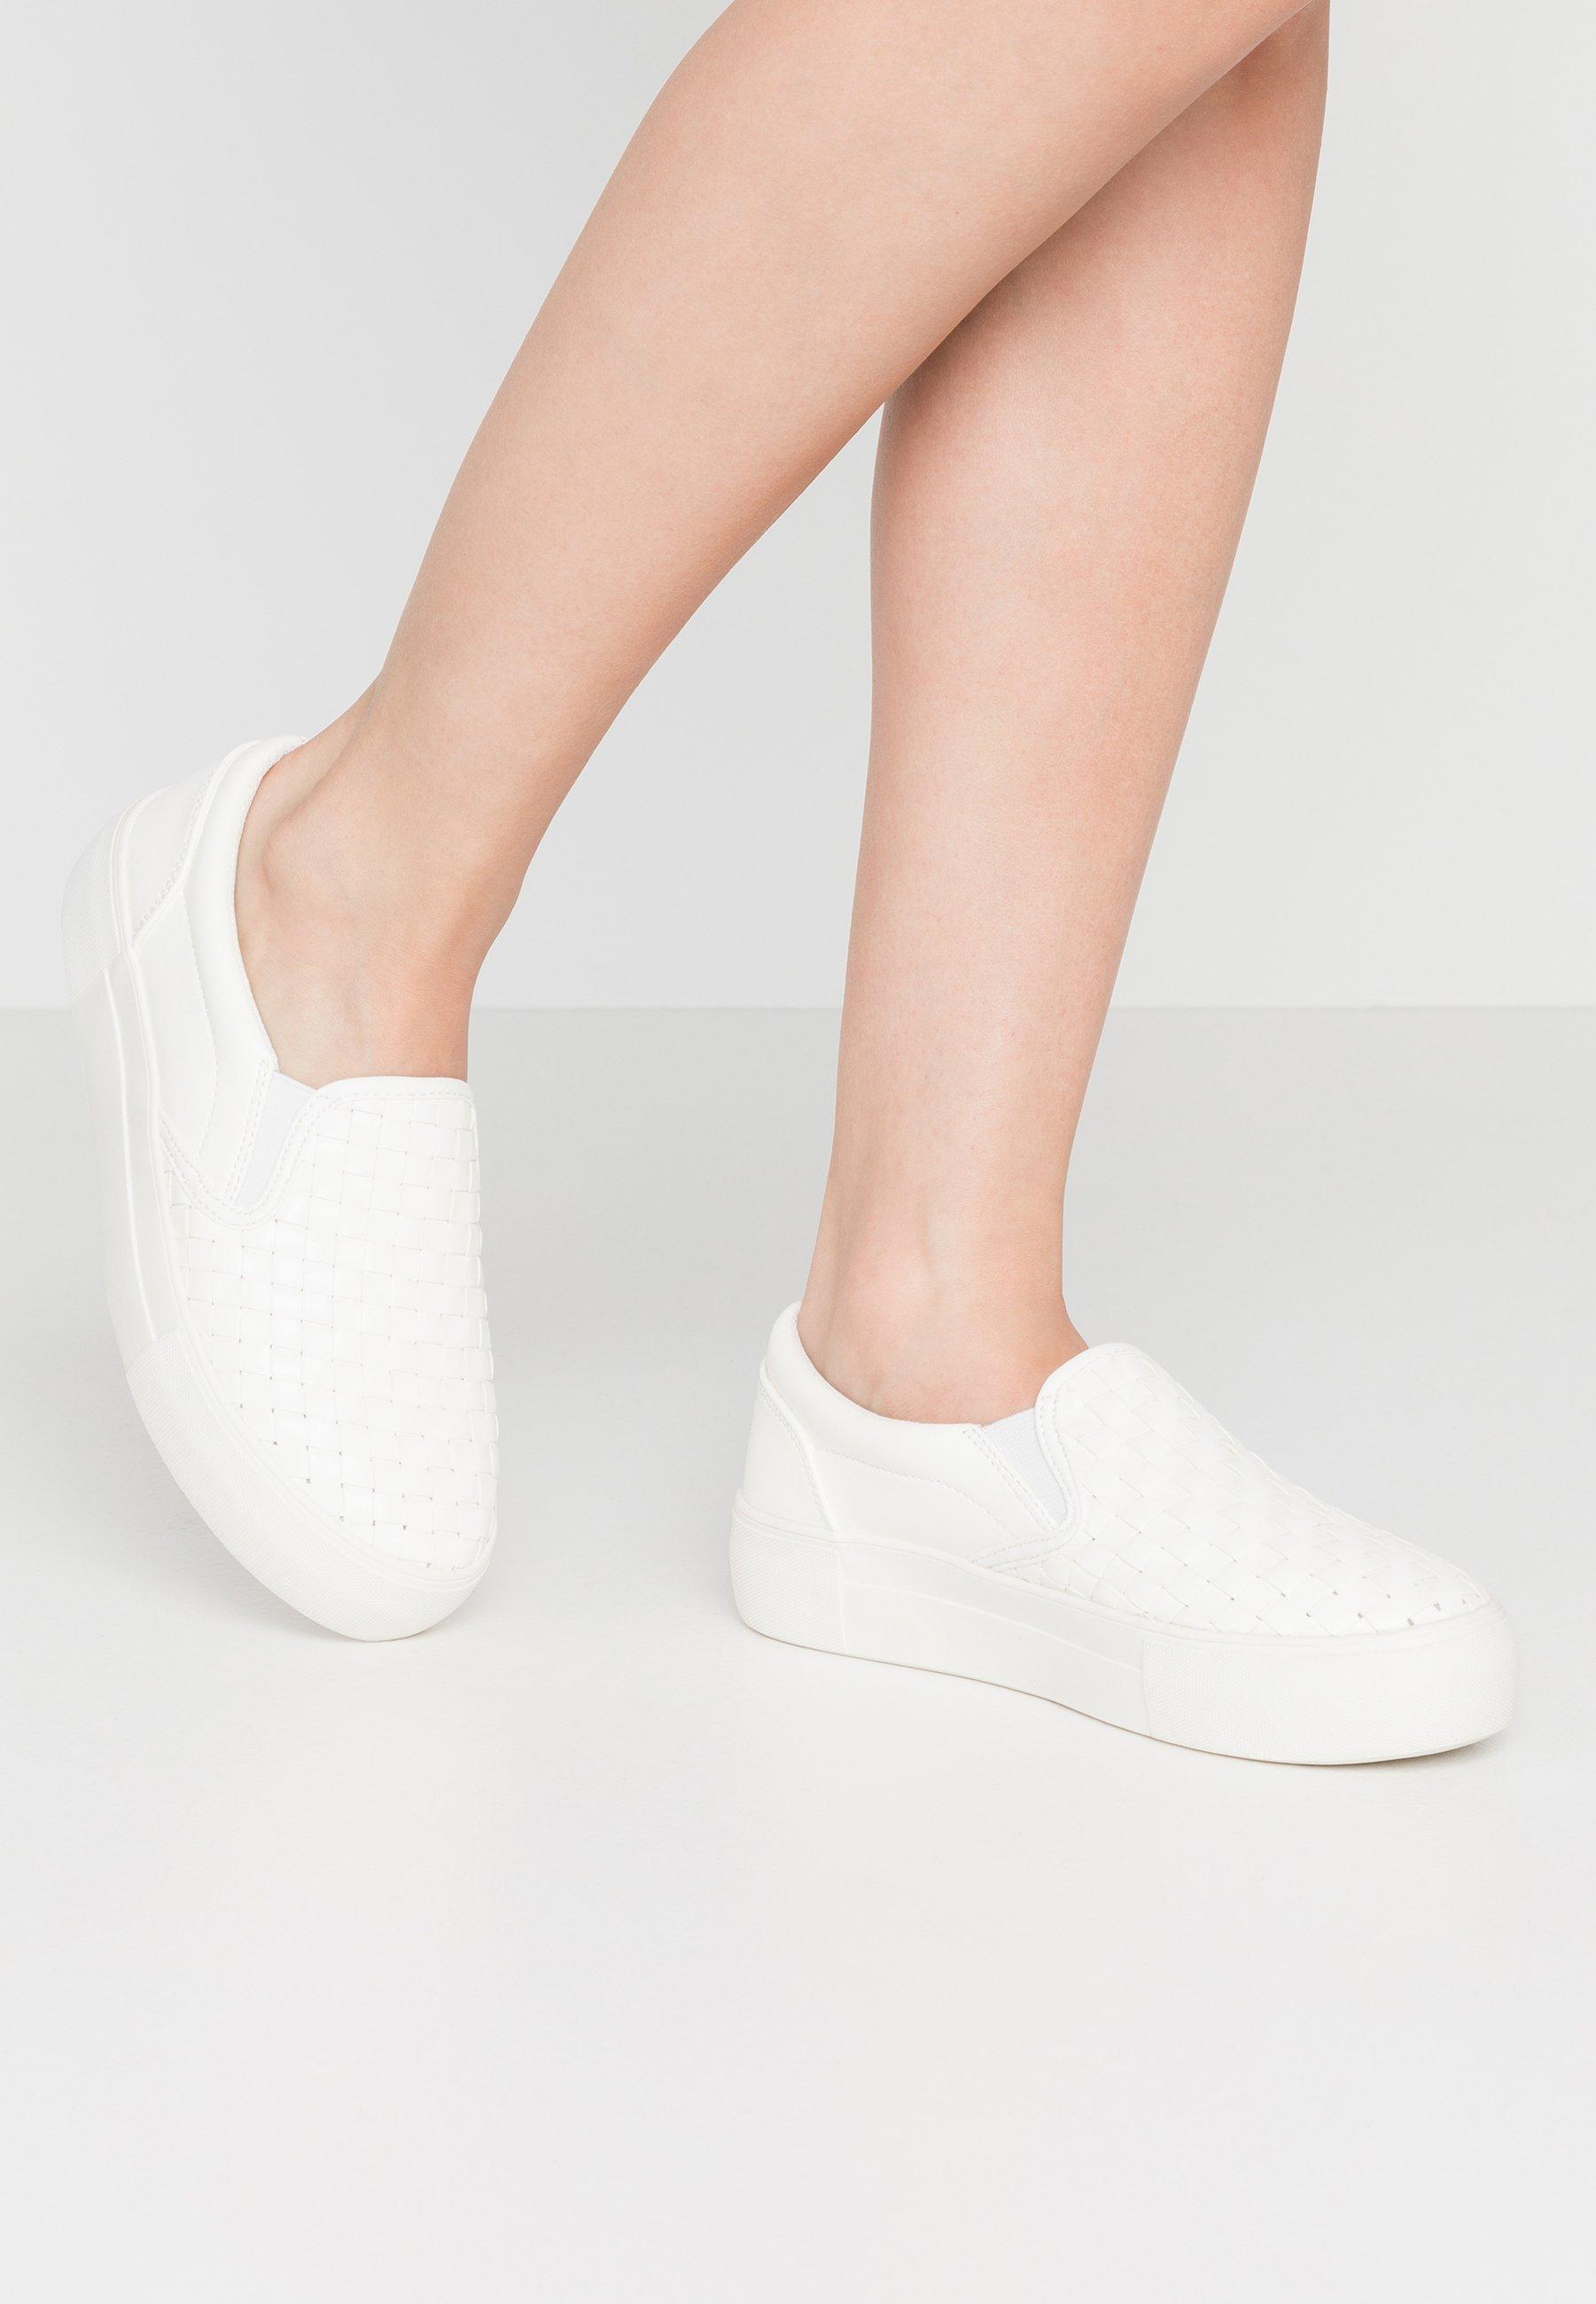 NA-KD BRAIDED TRAINERS - Mocassins - white - Mocassins & Chaussures bateau femme Qualité